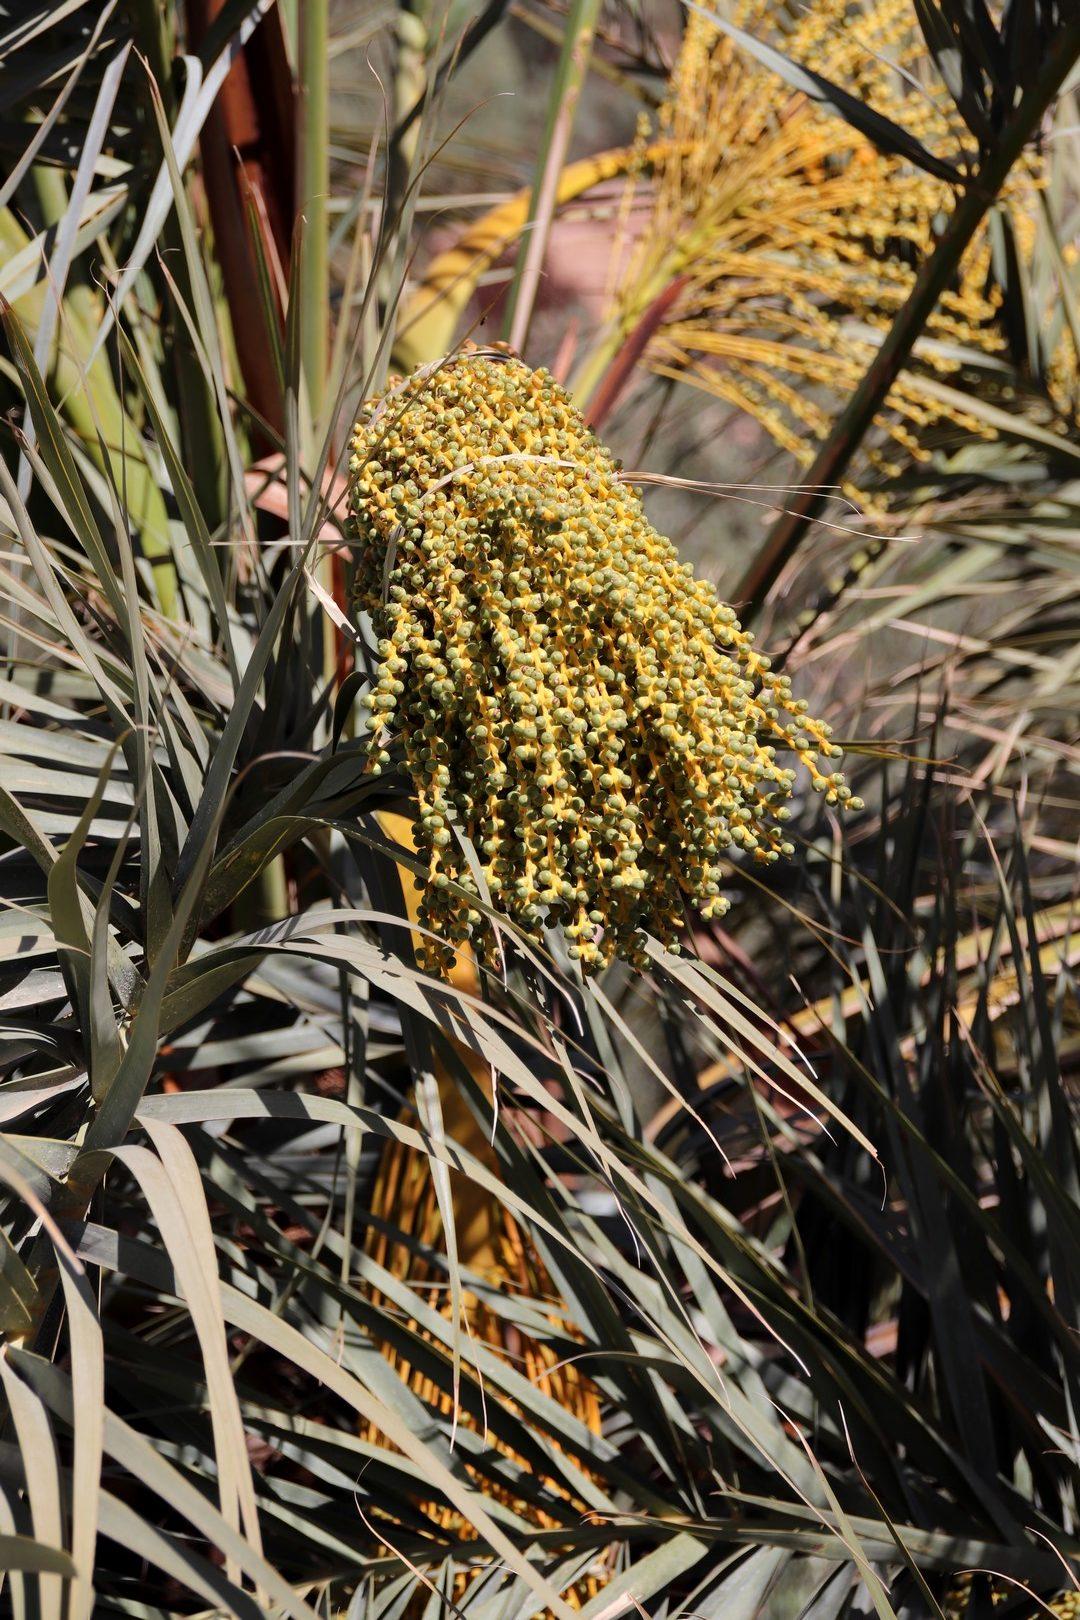 Maroc - Palmiers dattiers dans la palmeraie d'Erfoud